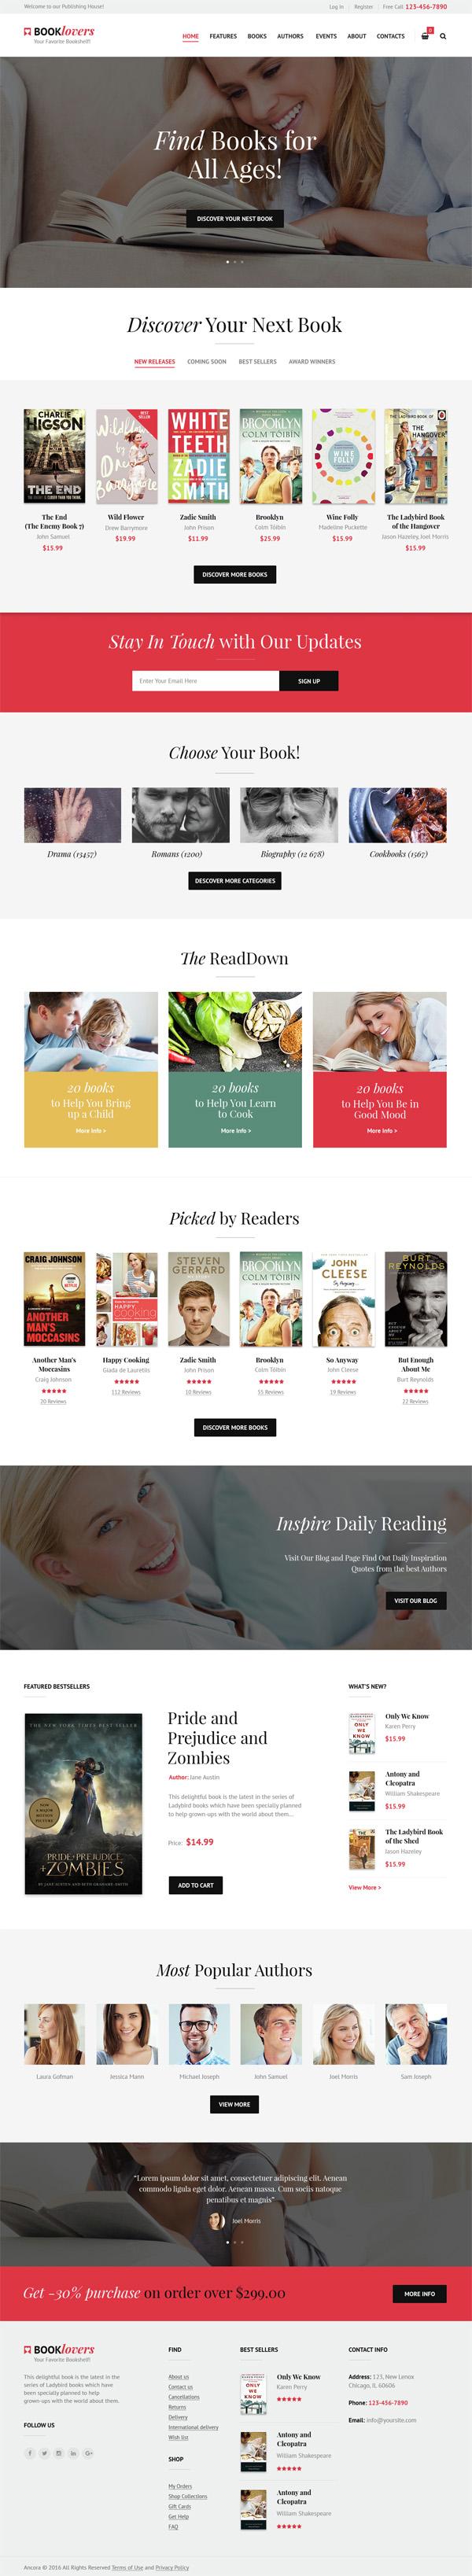 Booklovers – Publishing House & Book Store WordPress Theme